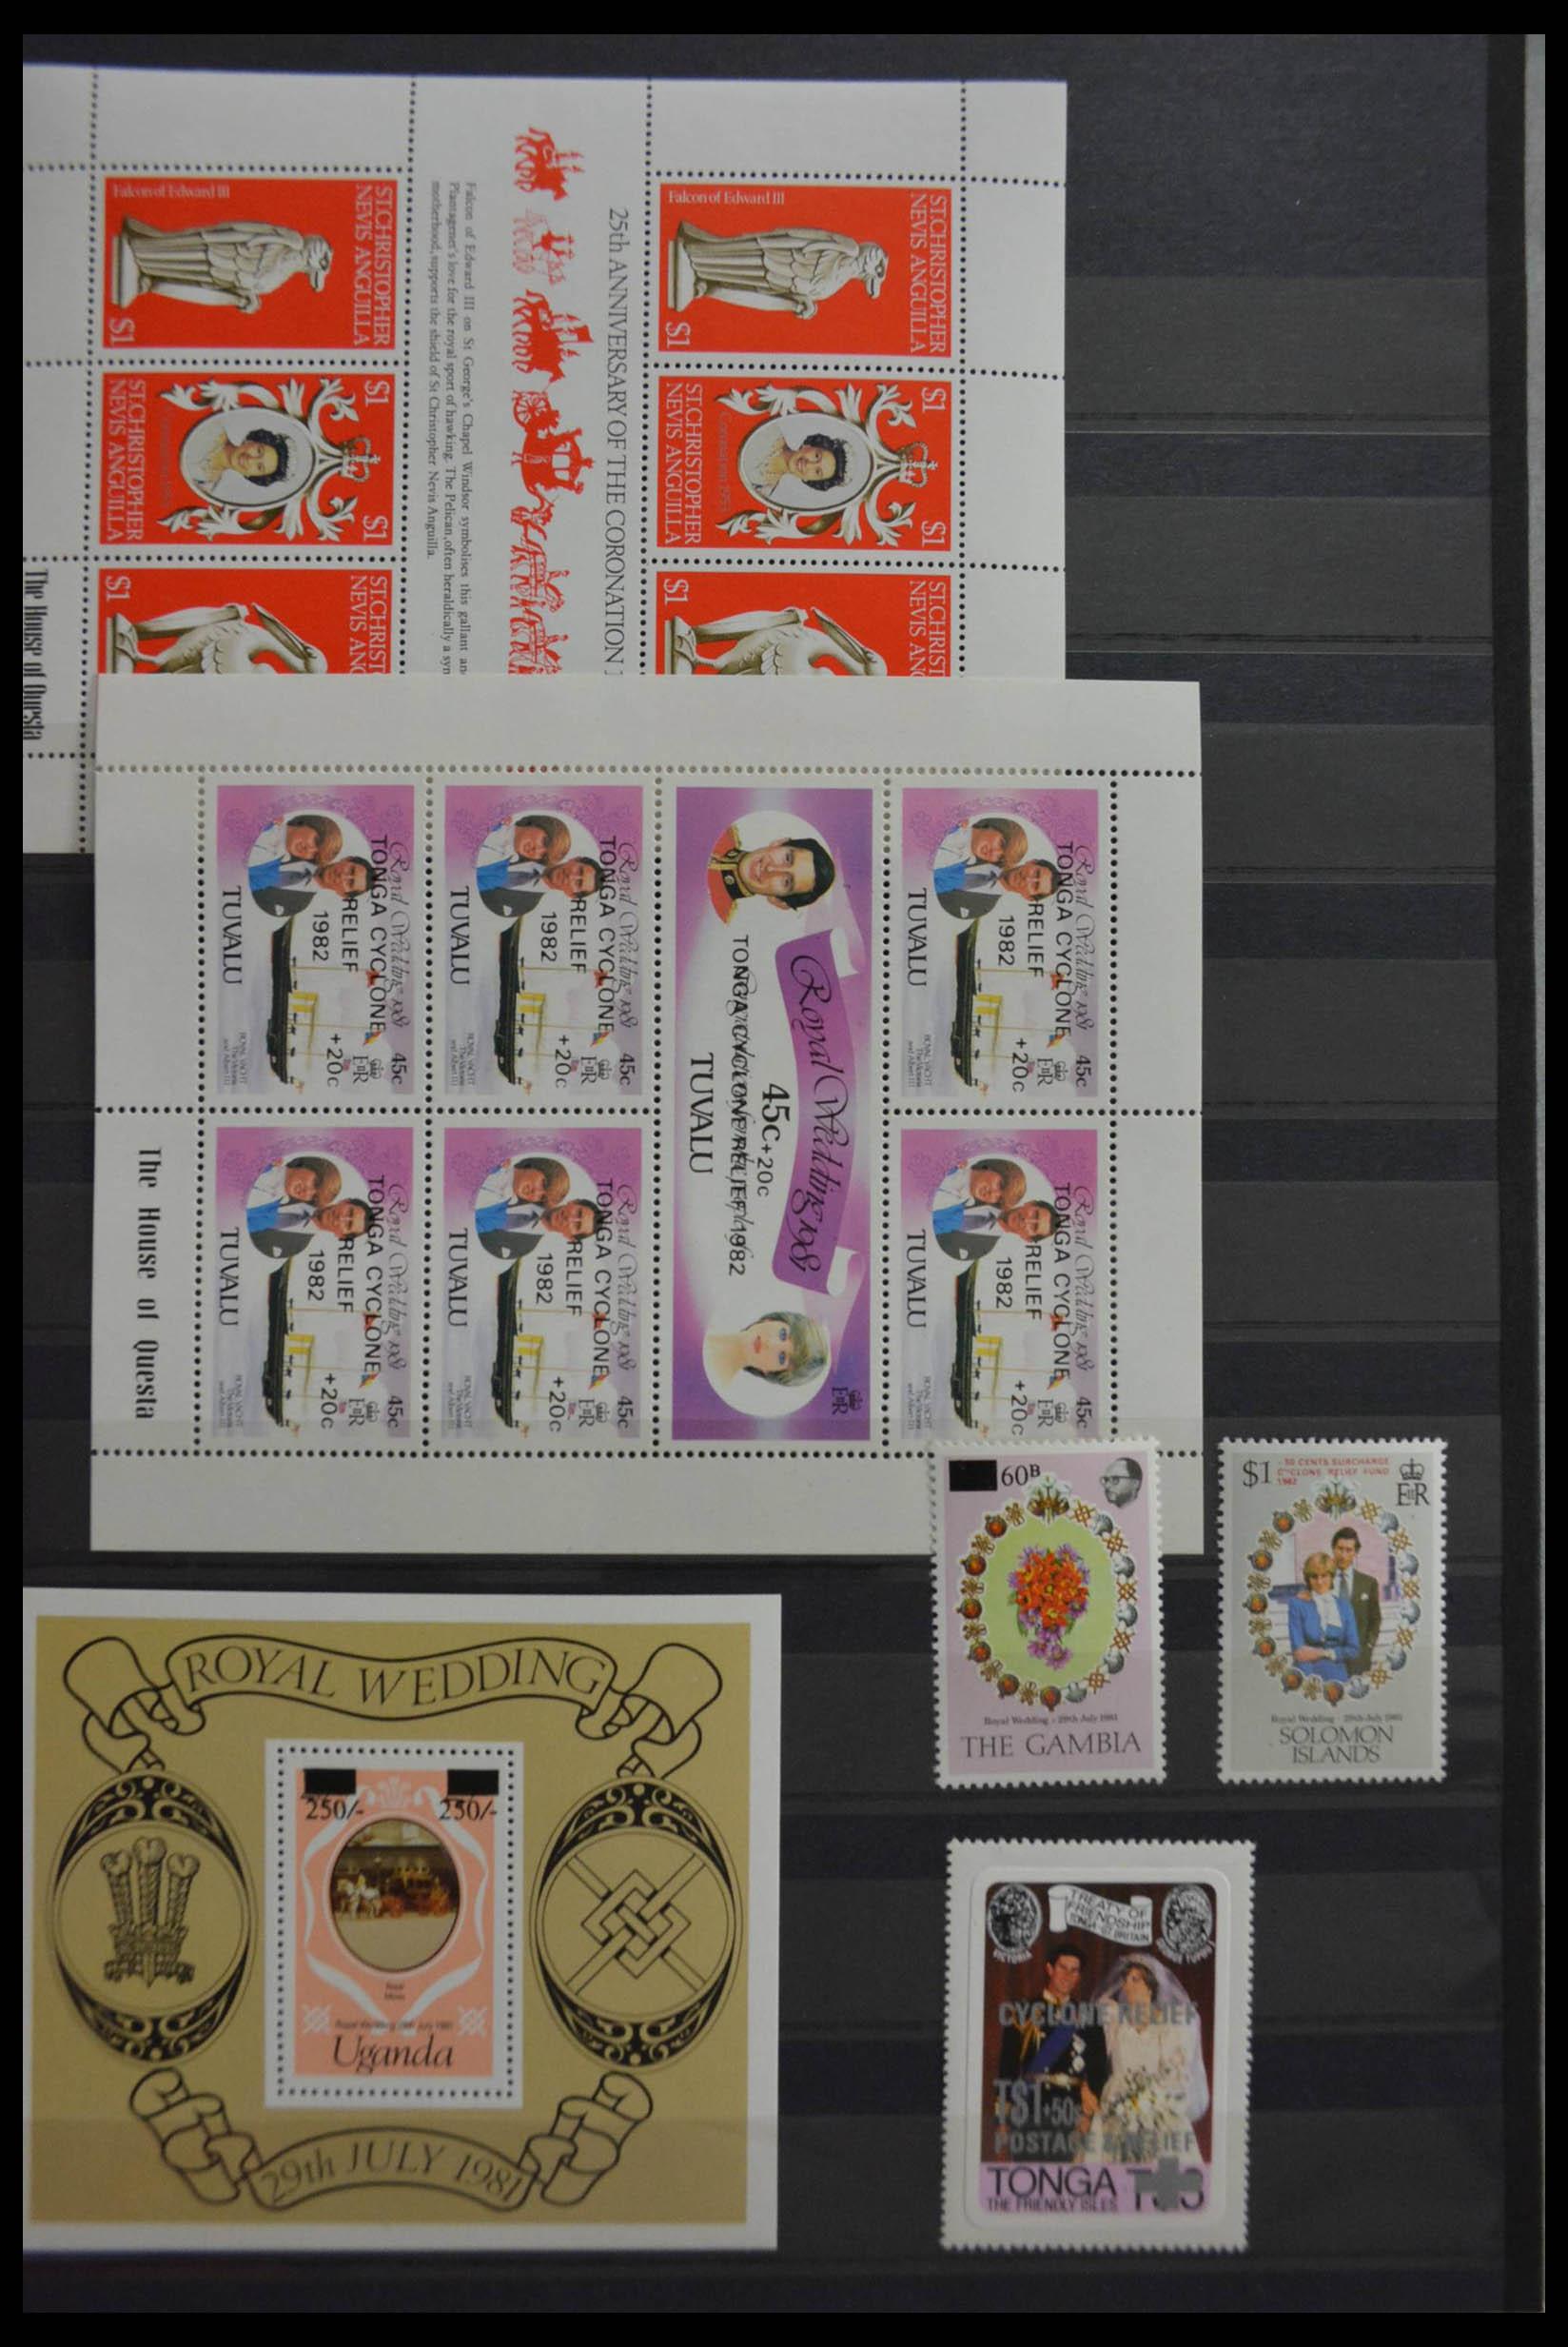 28512 013 - Postzegelverzameling 28512 Britse Gemenebest postfris.